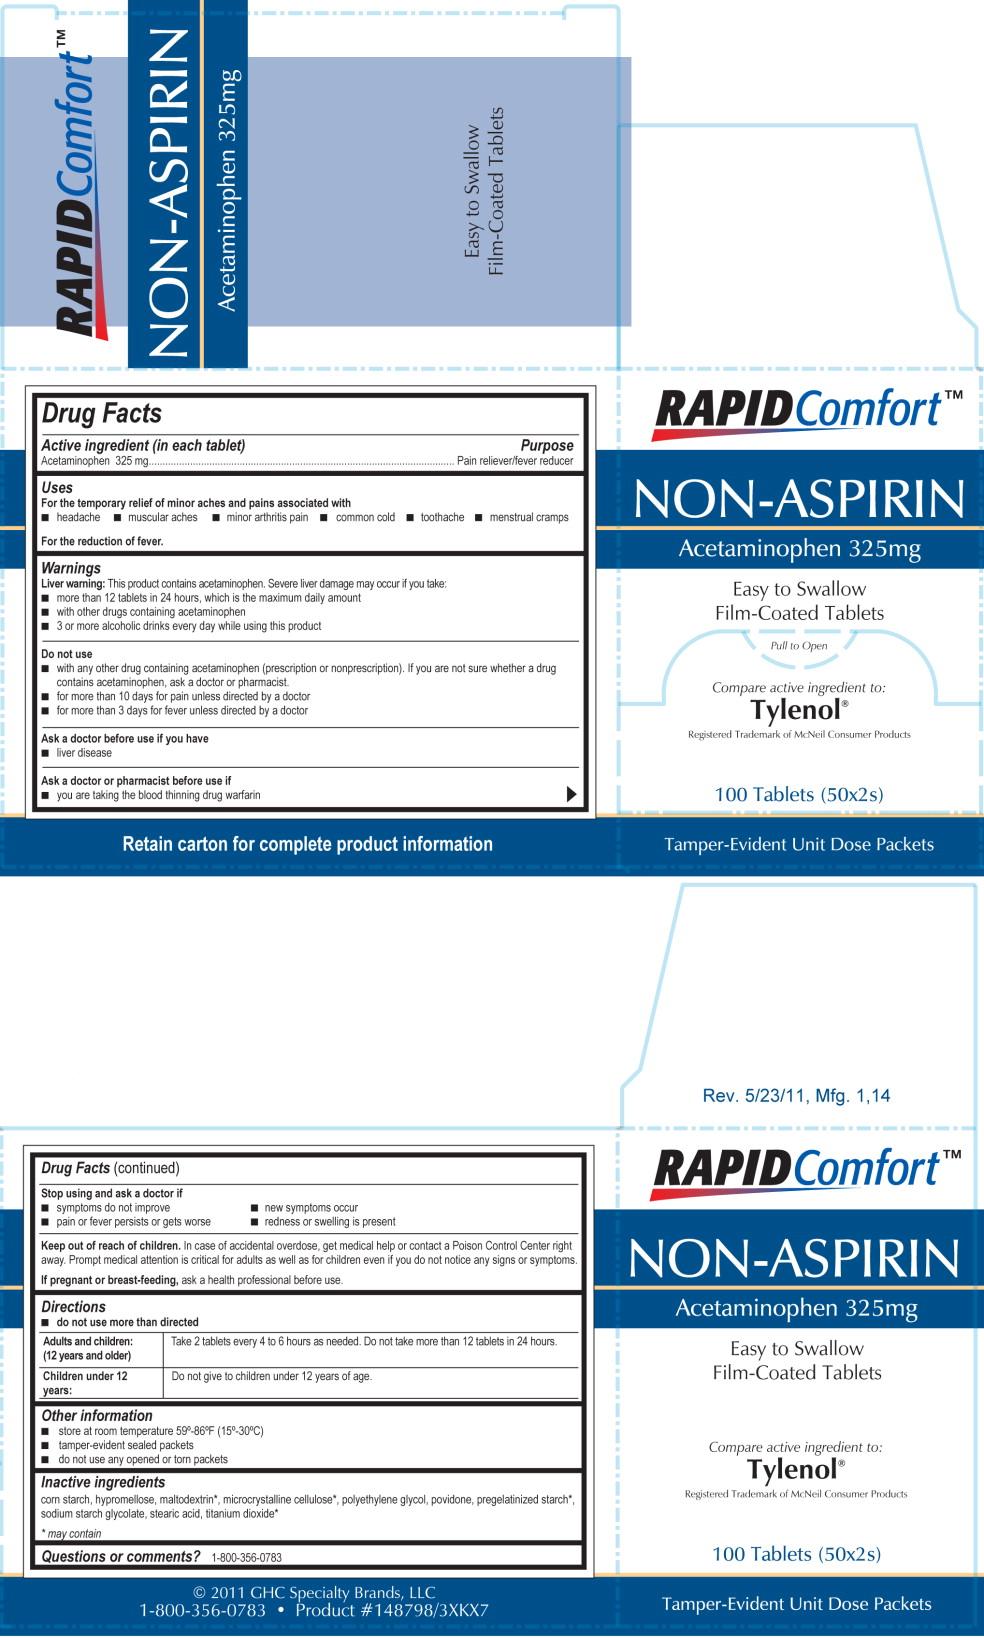 Rapid Comfort Non Aspirin (Acetaminophen) Tablet, Film Coated [Lab Safety Supply, Inc.]